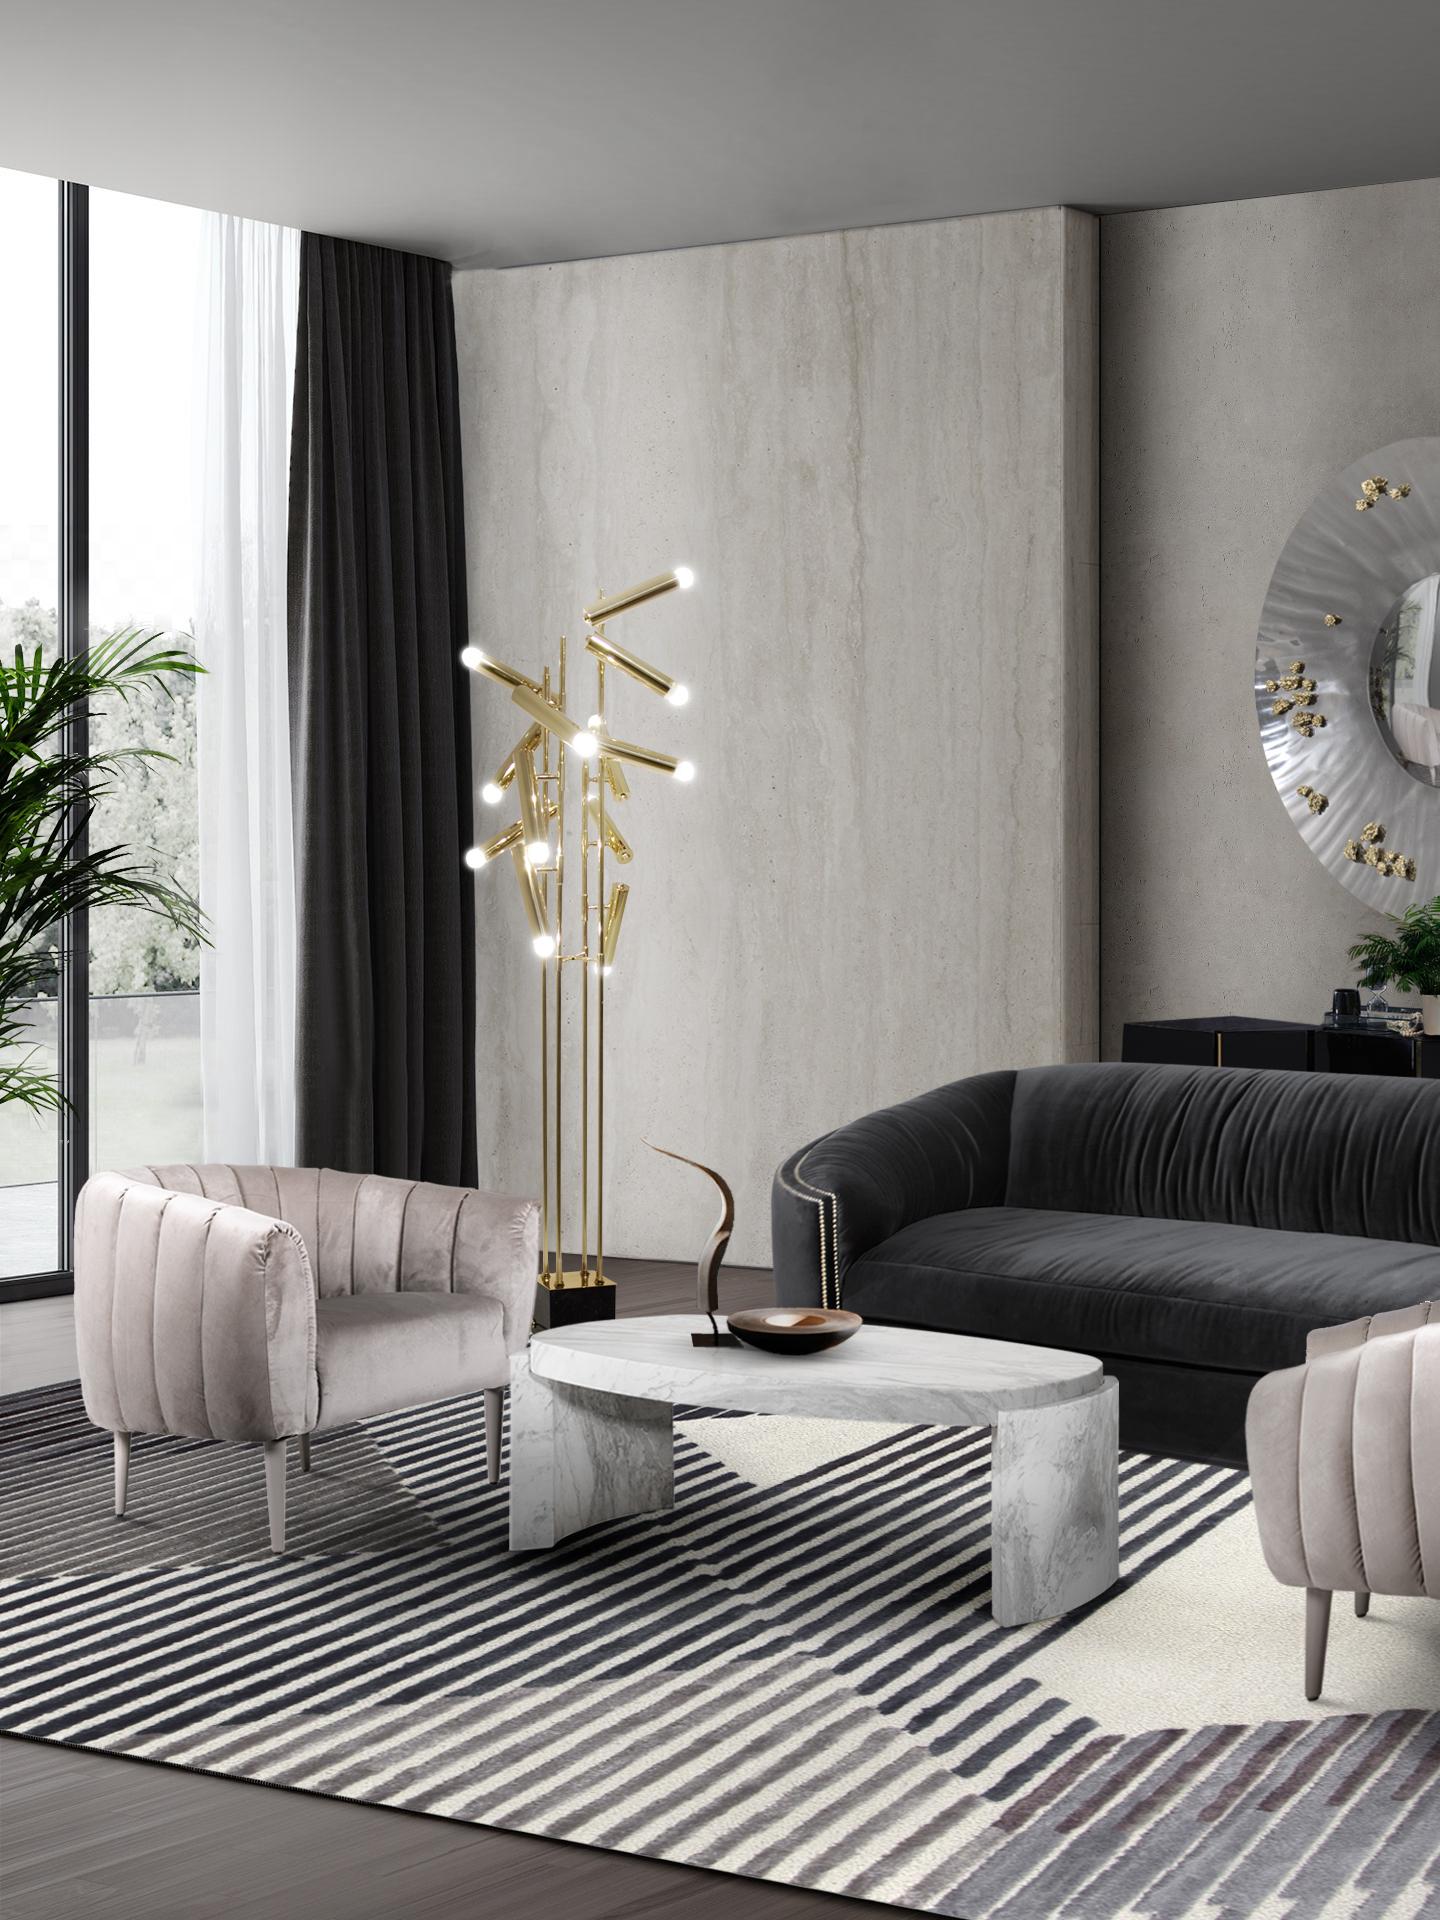 5 Grey Rugs For A Neutral Design grey 6 Grey Rugs For An Elegant Design Air Grey